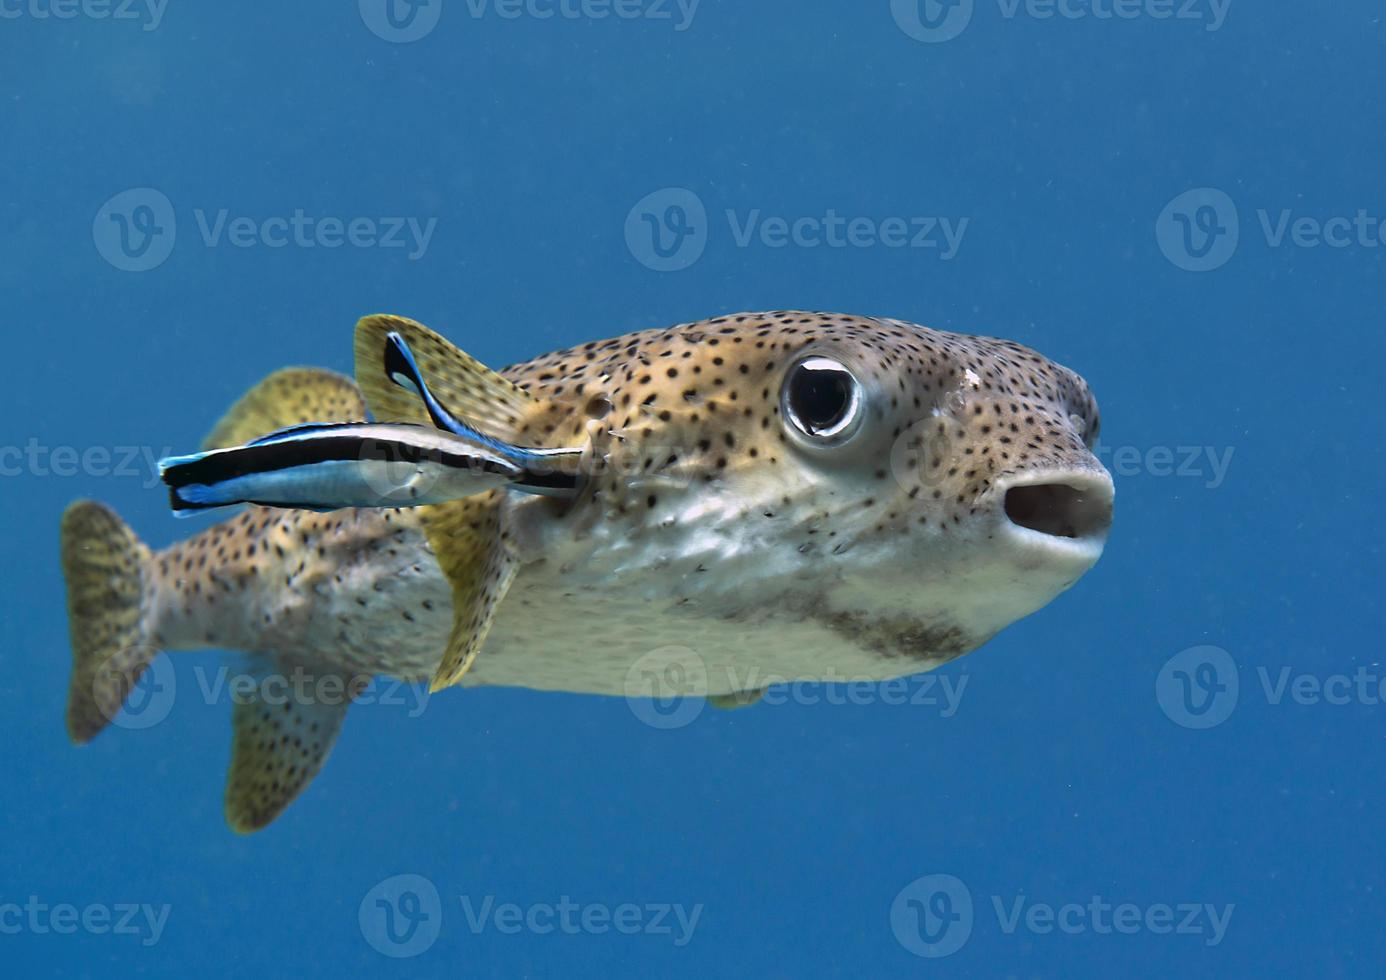 Stachelschweinfisch, Kugelfisch, Bluestreak Cleaner Lippfisch foto